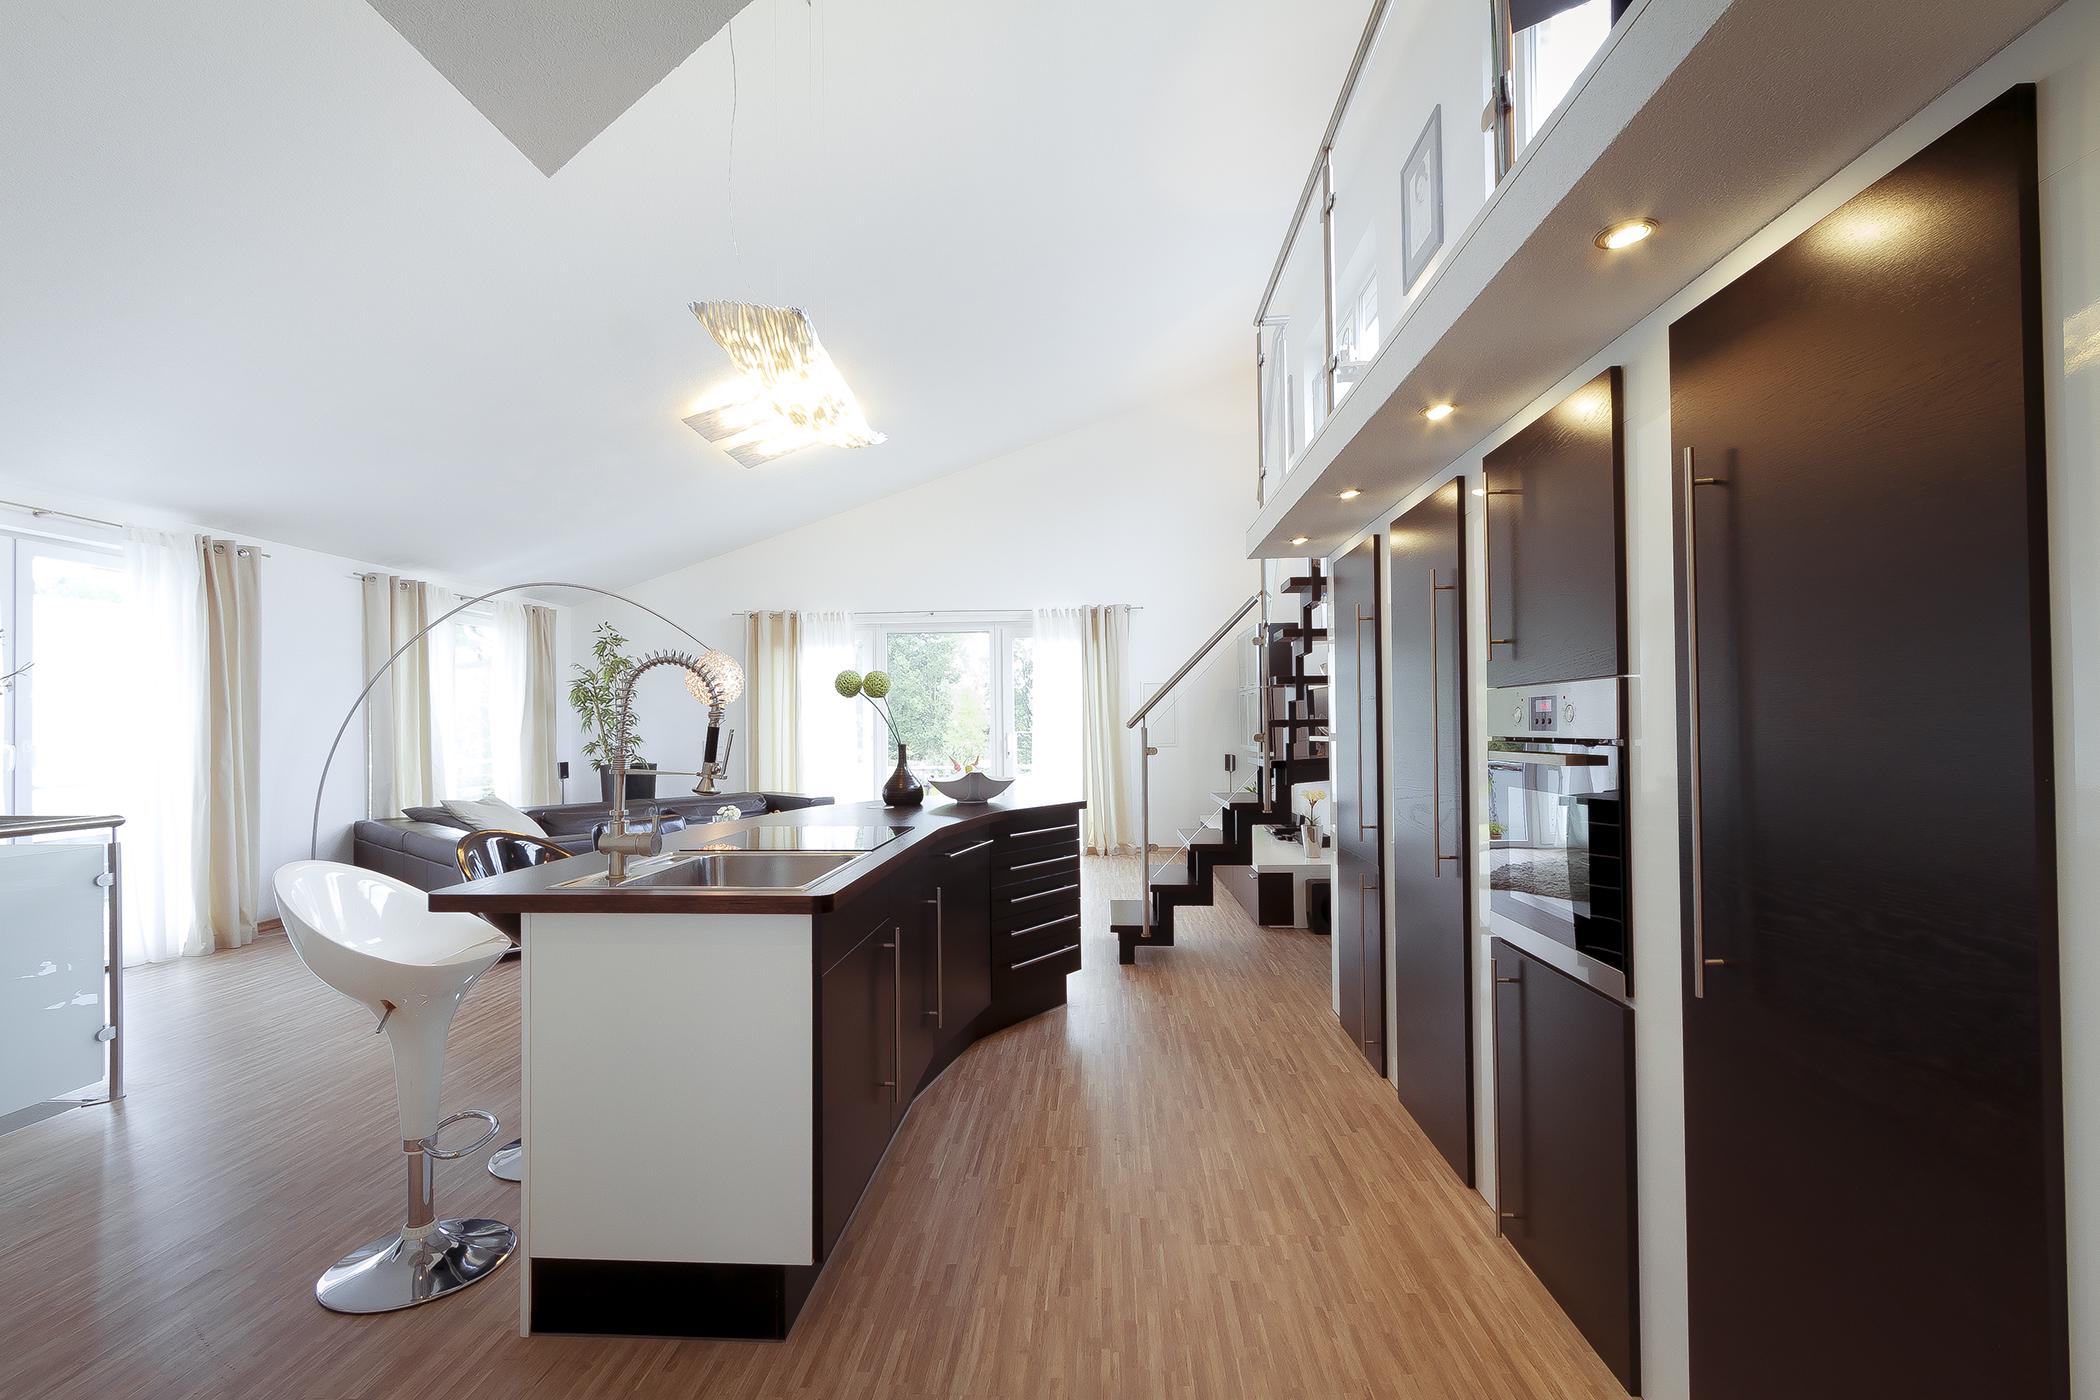 Innenarchitektur-Marius-Thessenvitz-Dachkomplett-2